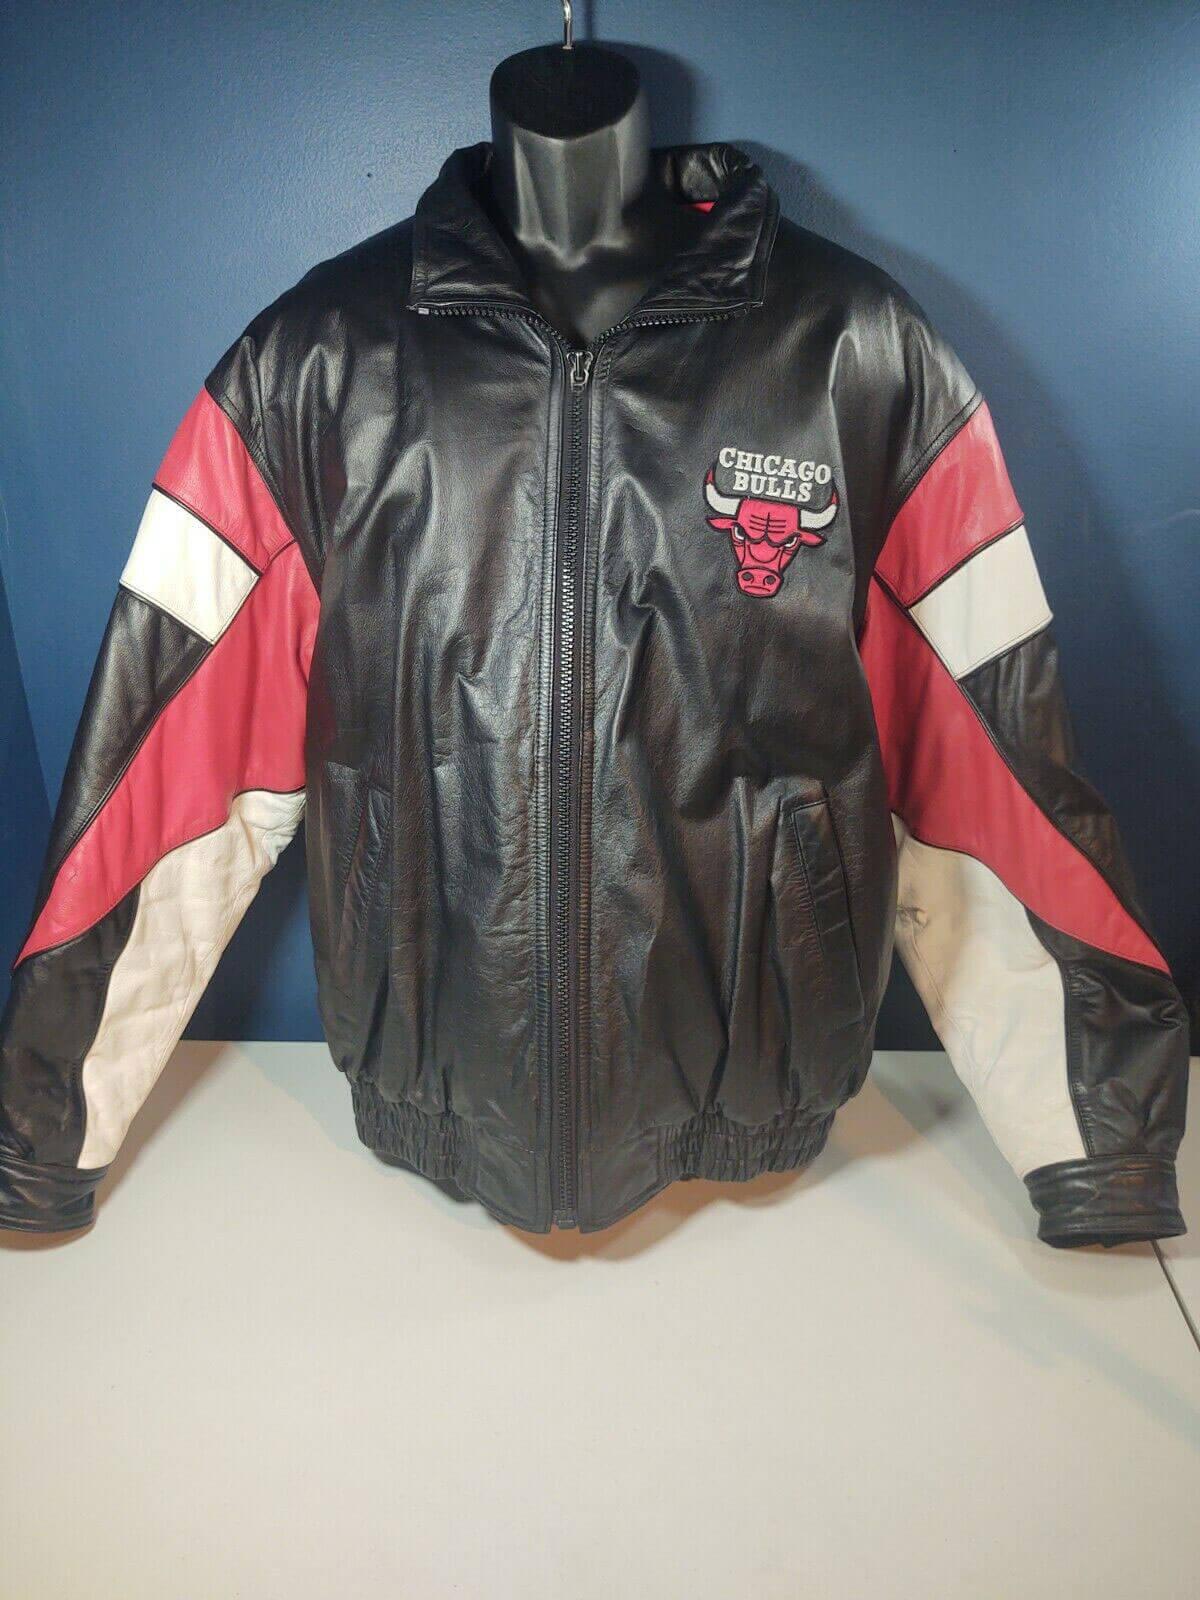 Chicago Bulls NBA Pro Player Leather Jacket